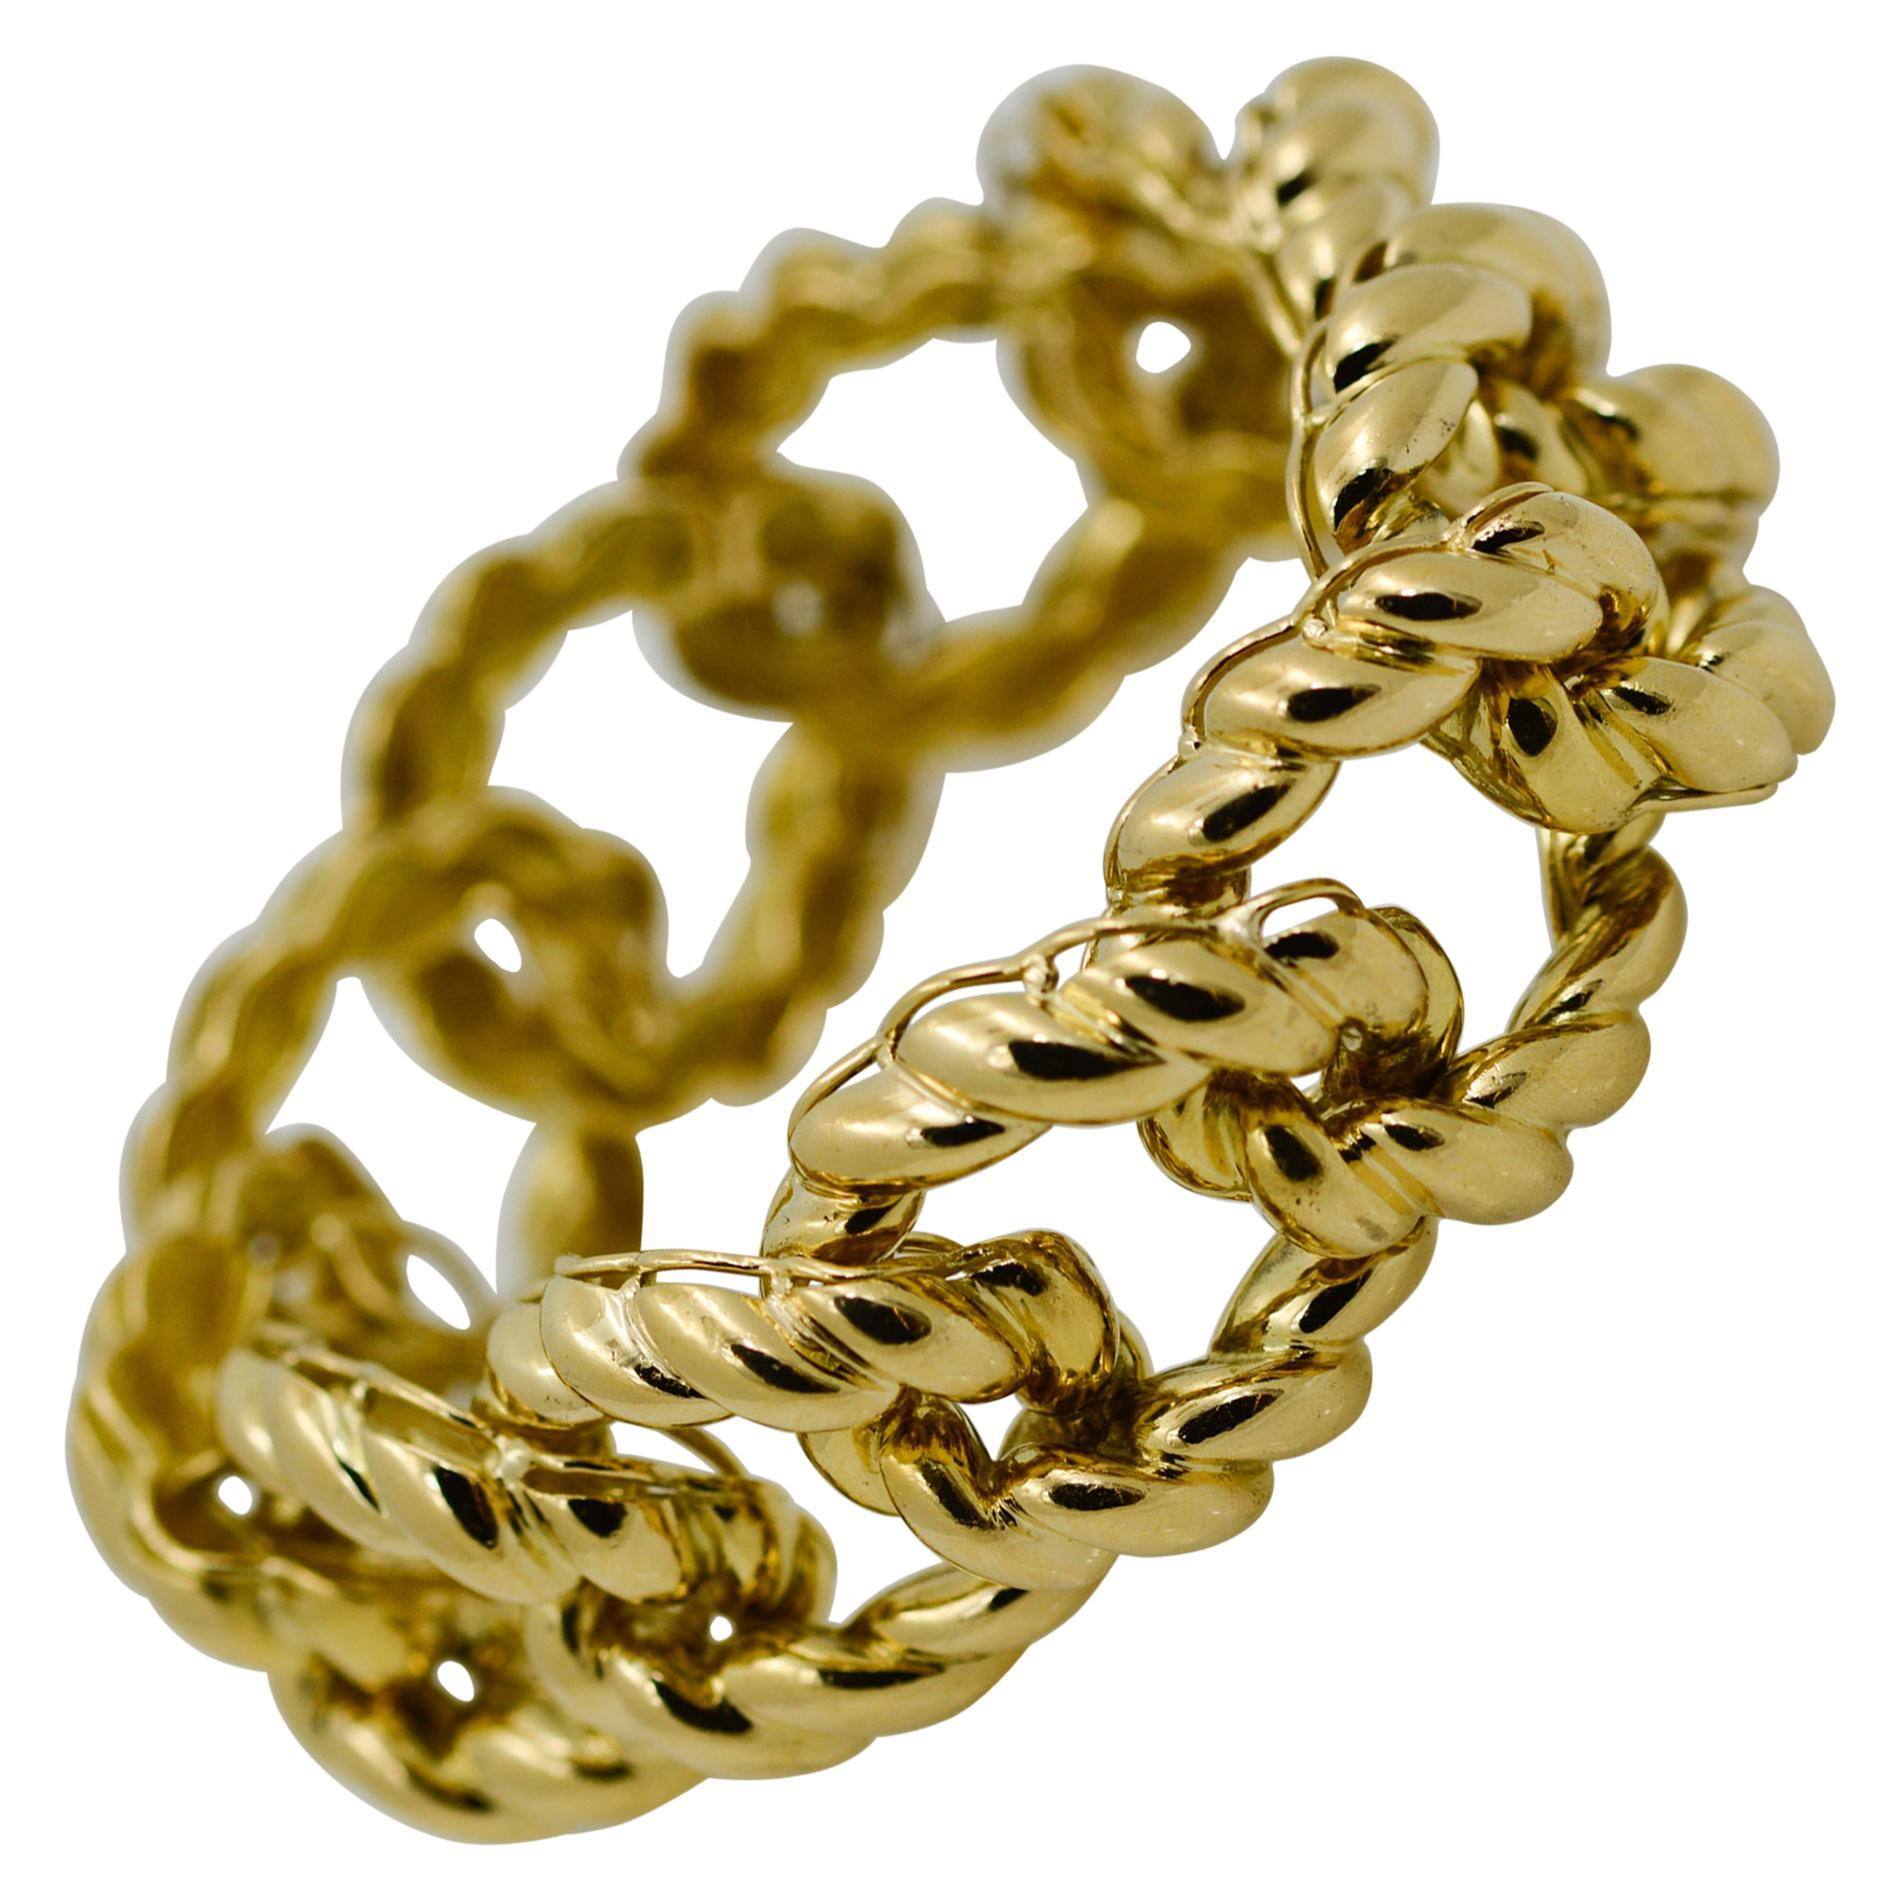 18 Karat Yellow Gold Textured Curb Link Bracelet